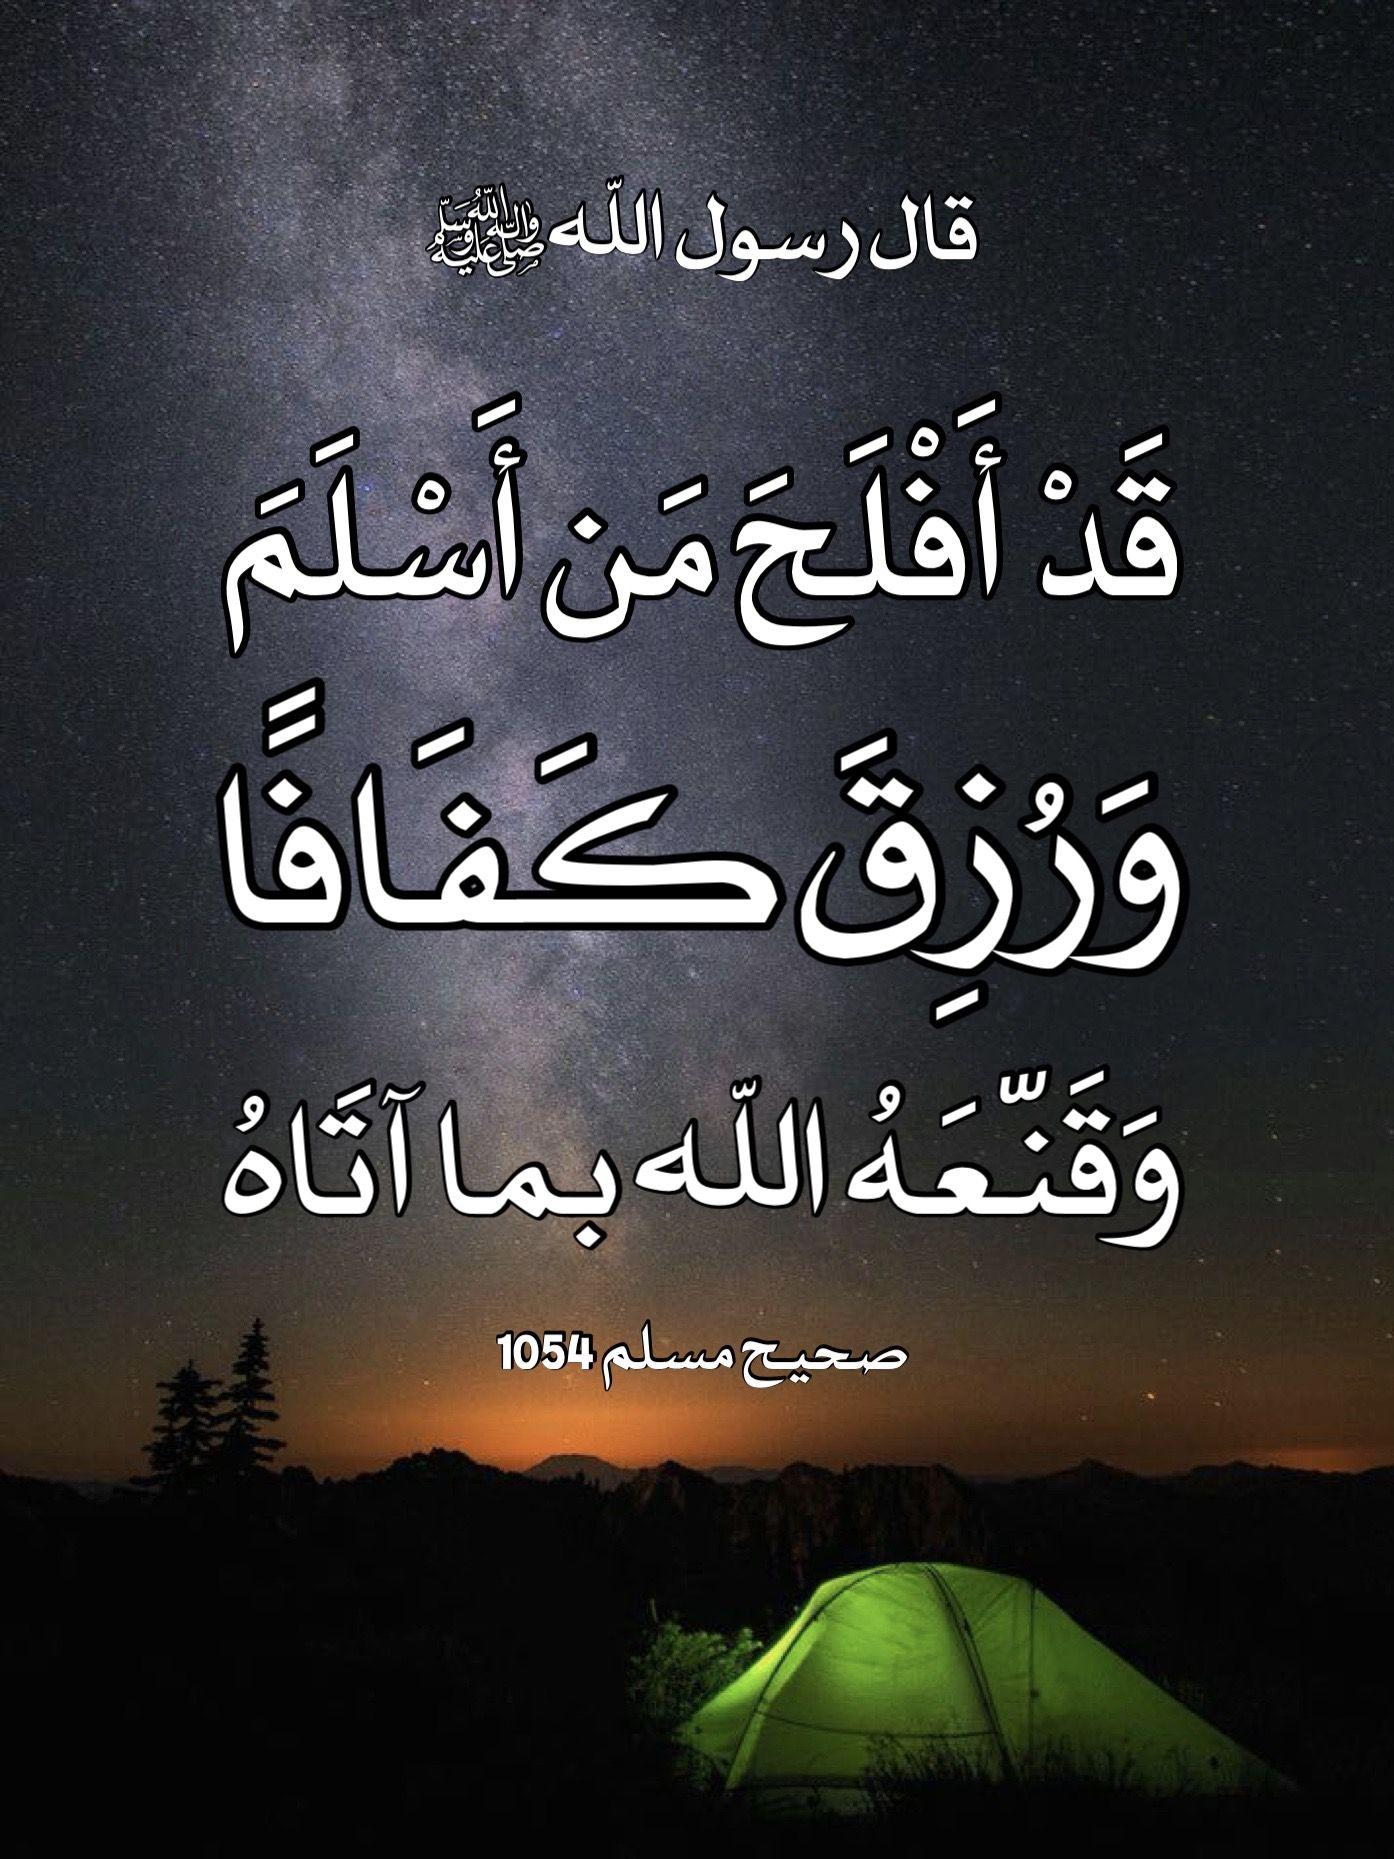 Pin By الأثر الجميل On أحاديث نبوية Islam Facts Words Quotes Quotes